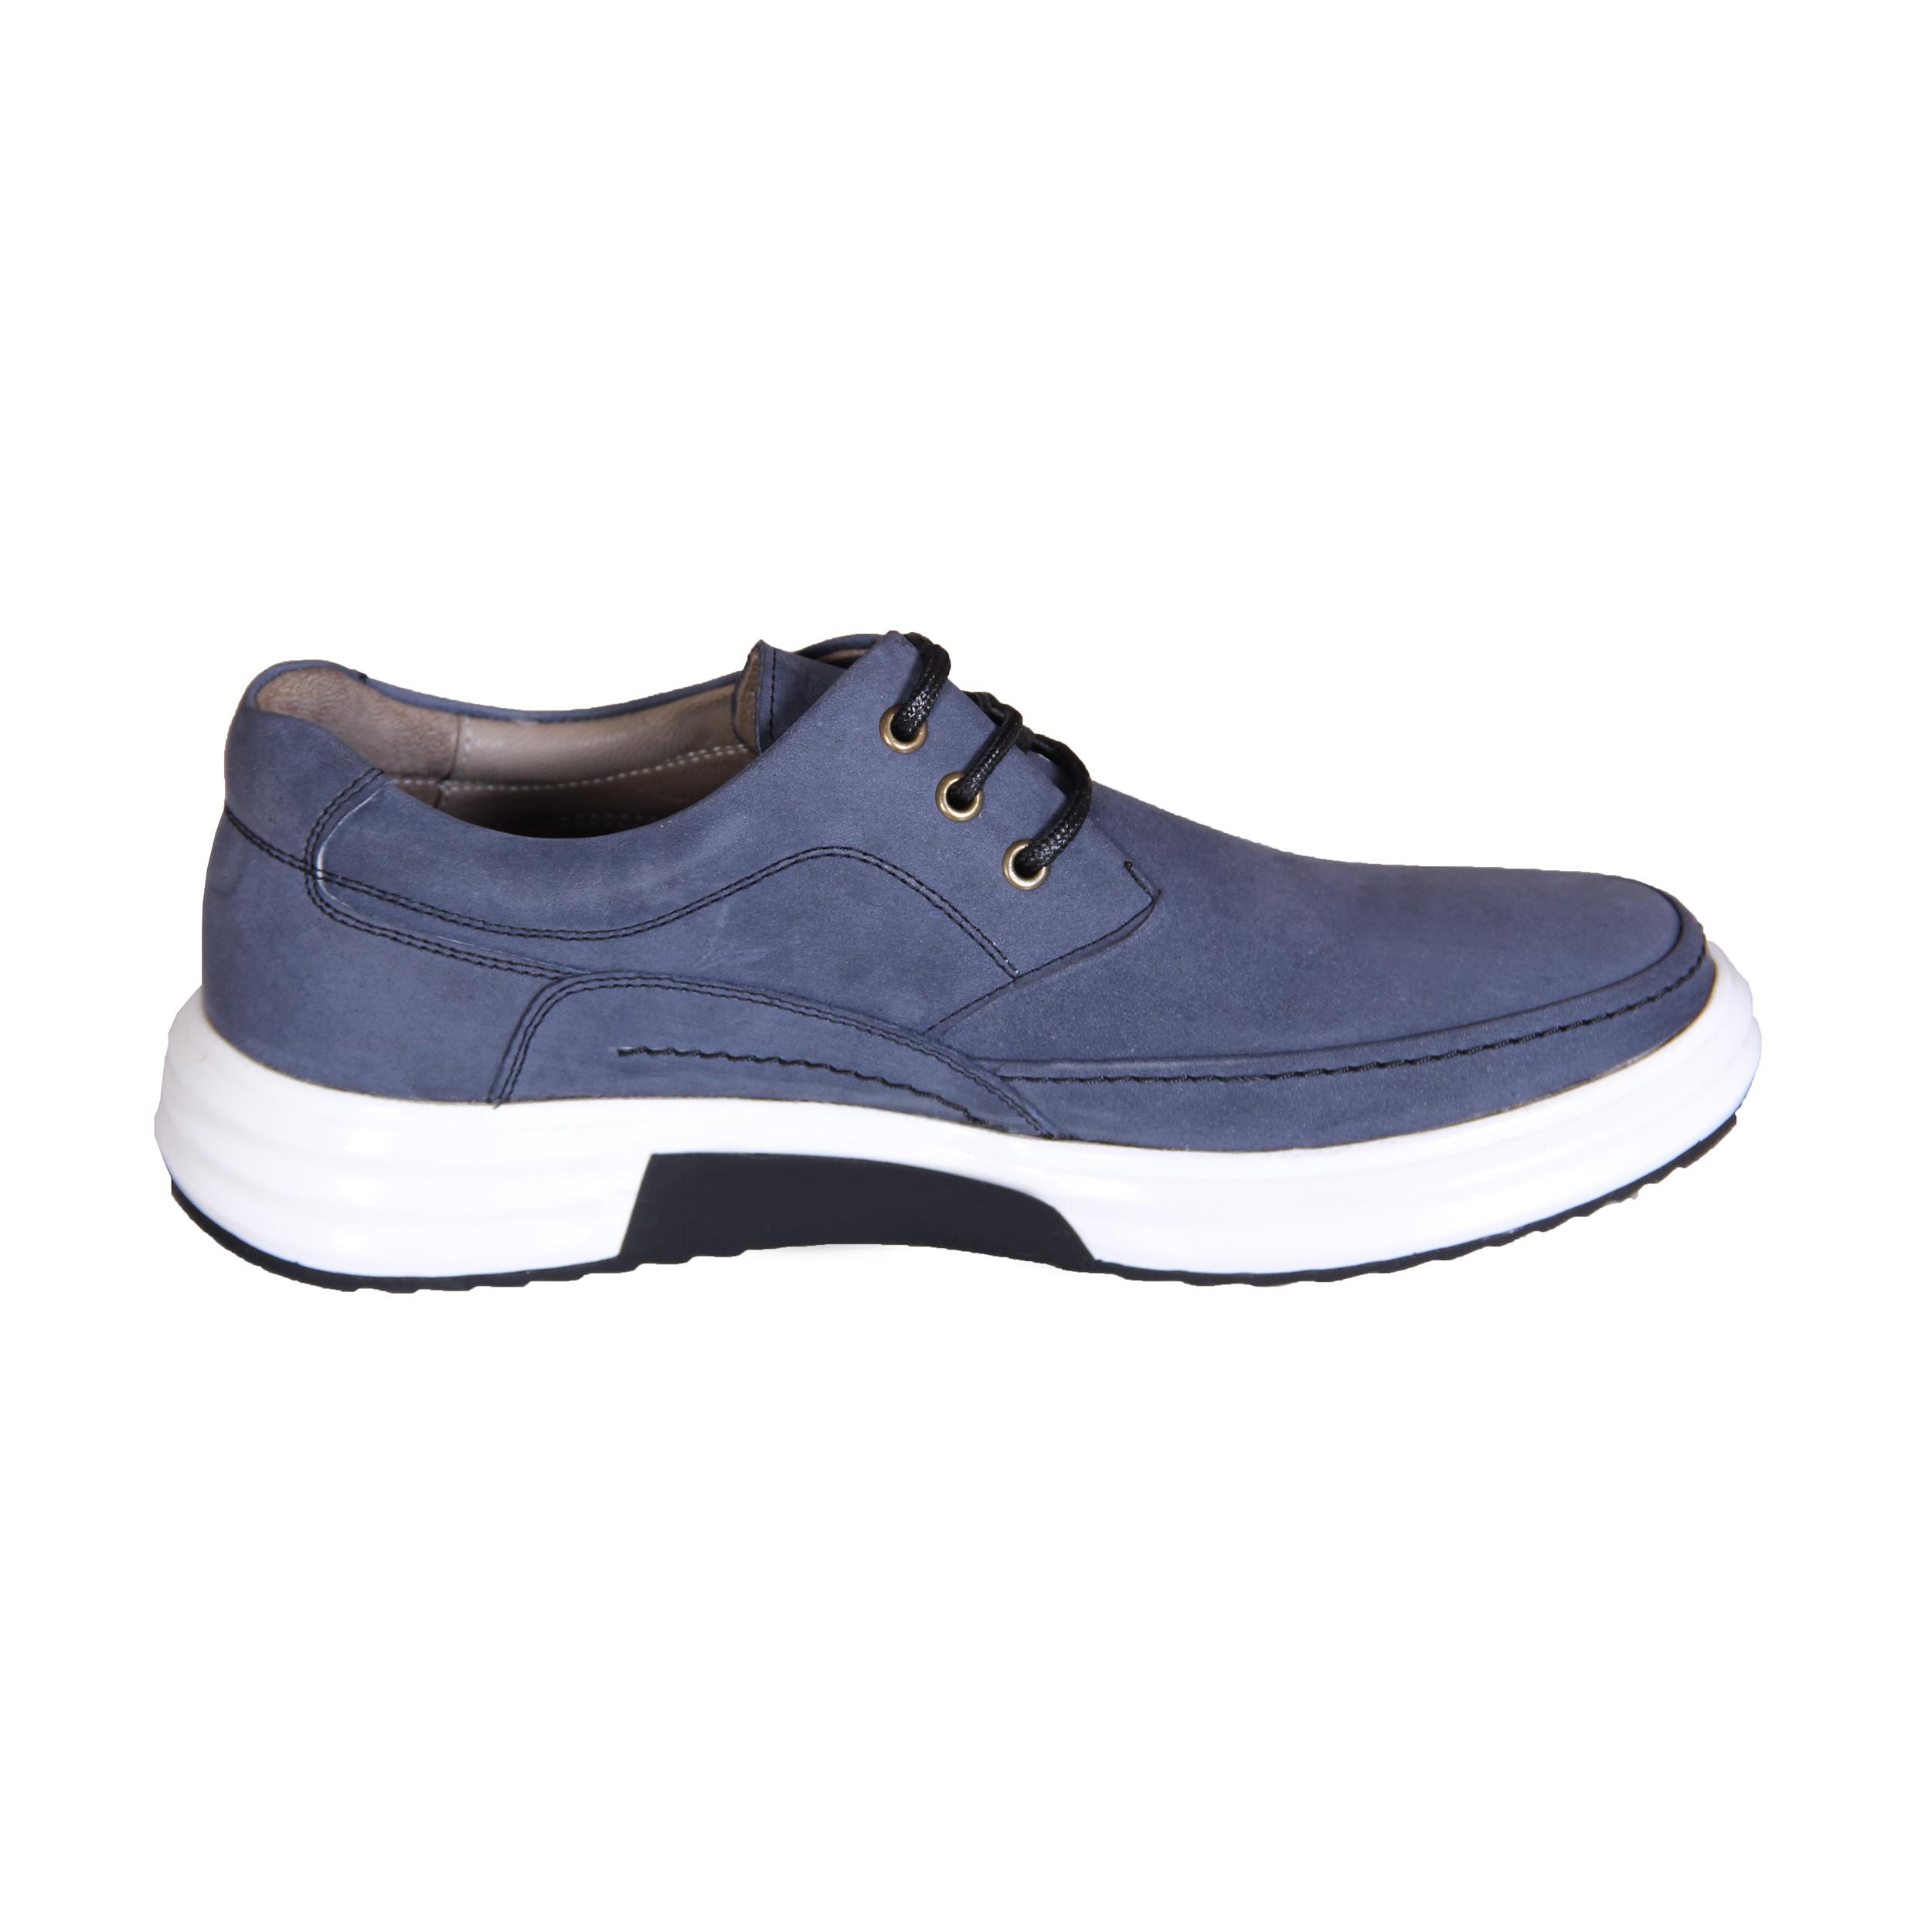 SHAHRECHARM men's casual shoes, F6047-13 Model